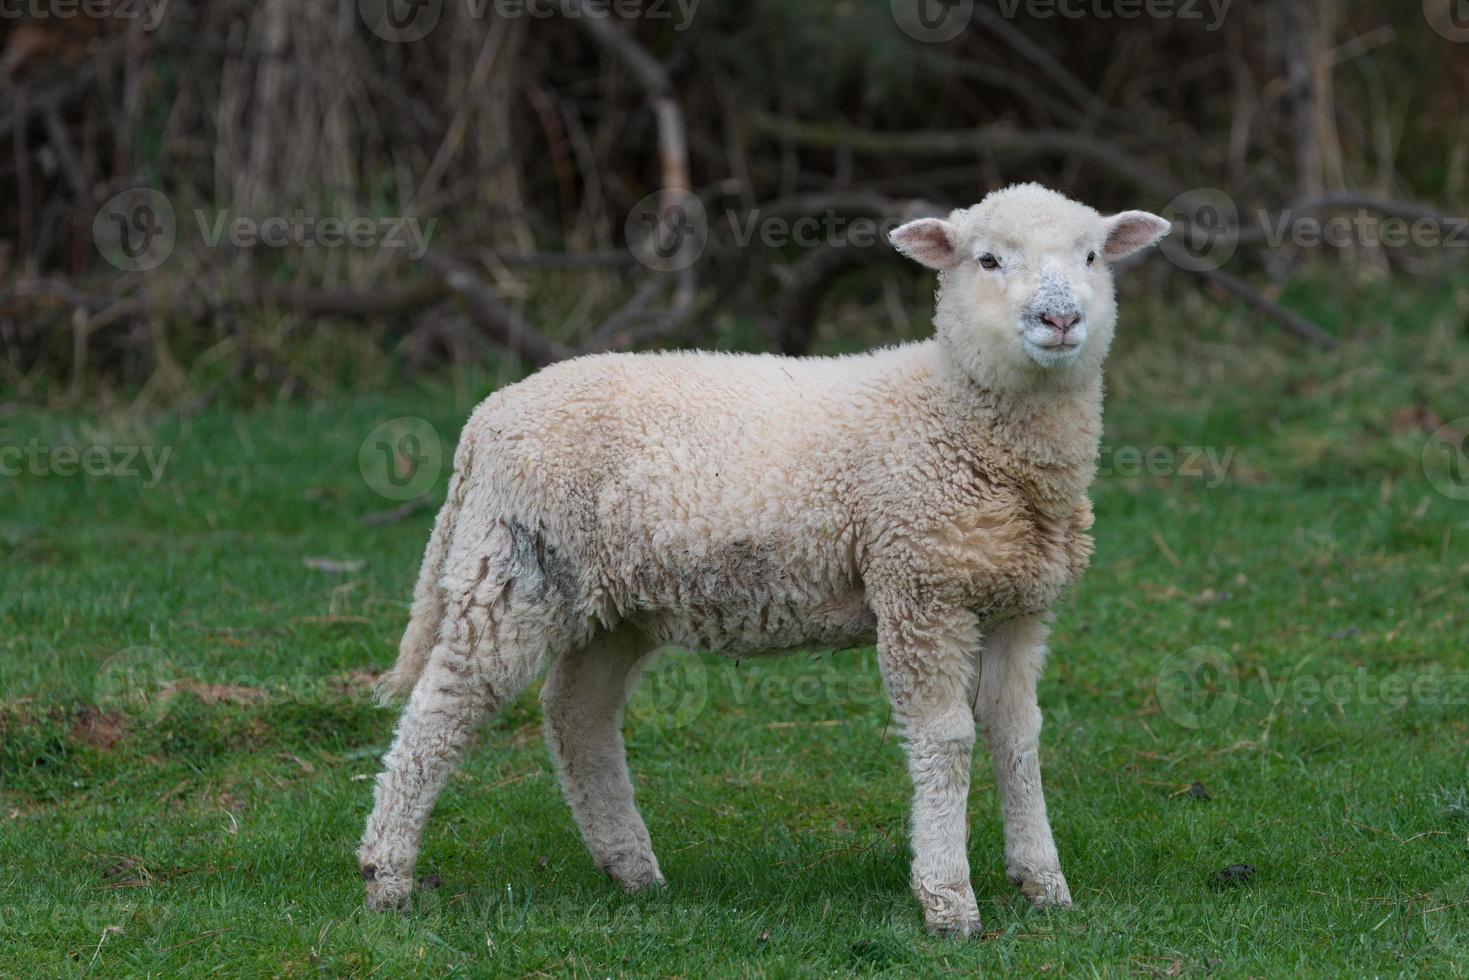 Sheep in a paddock photo